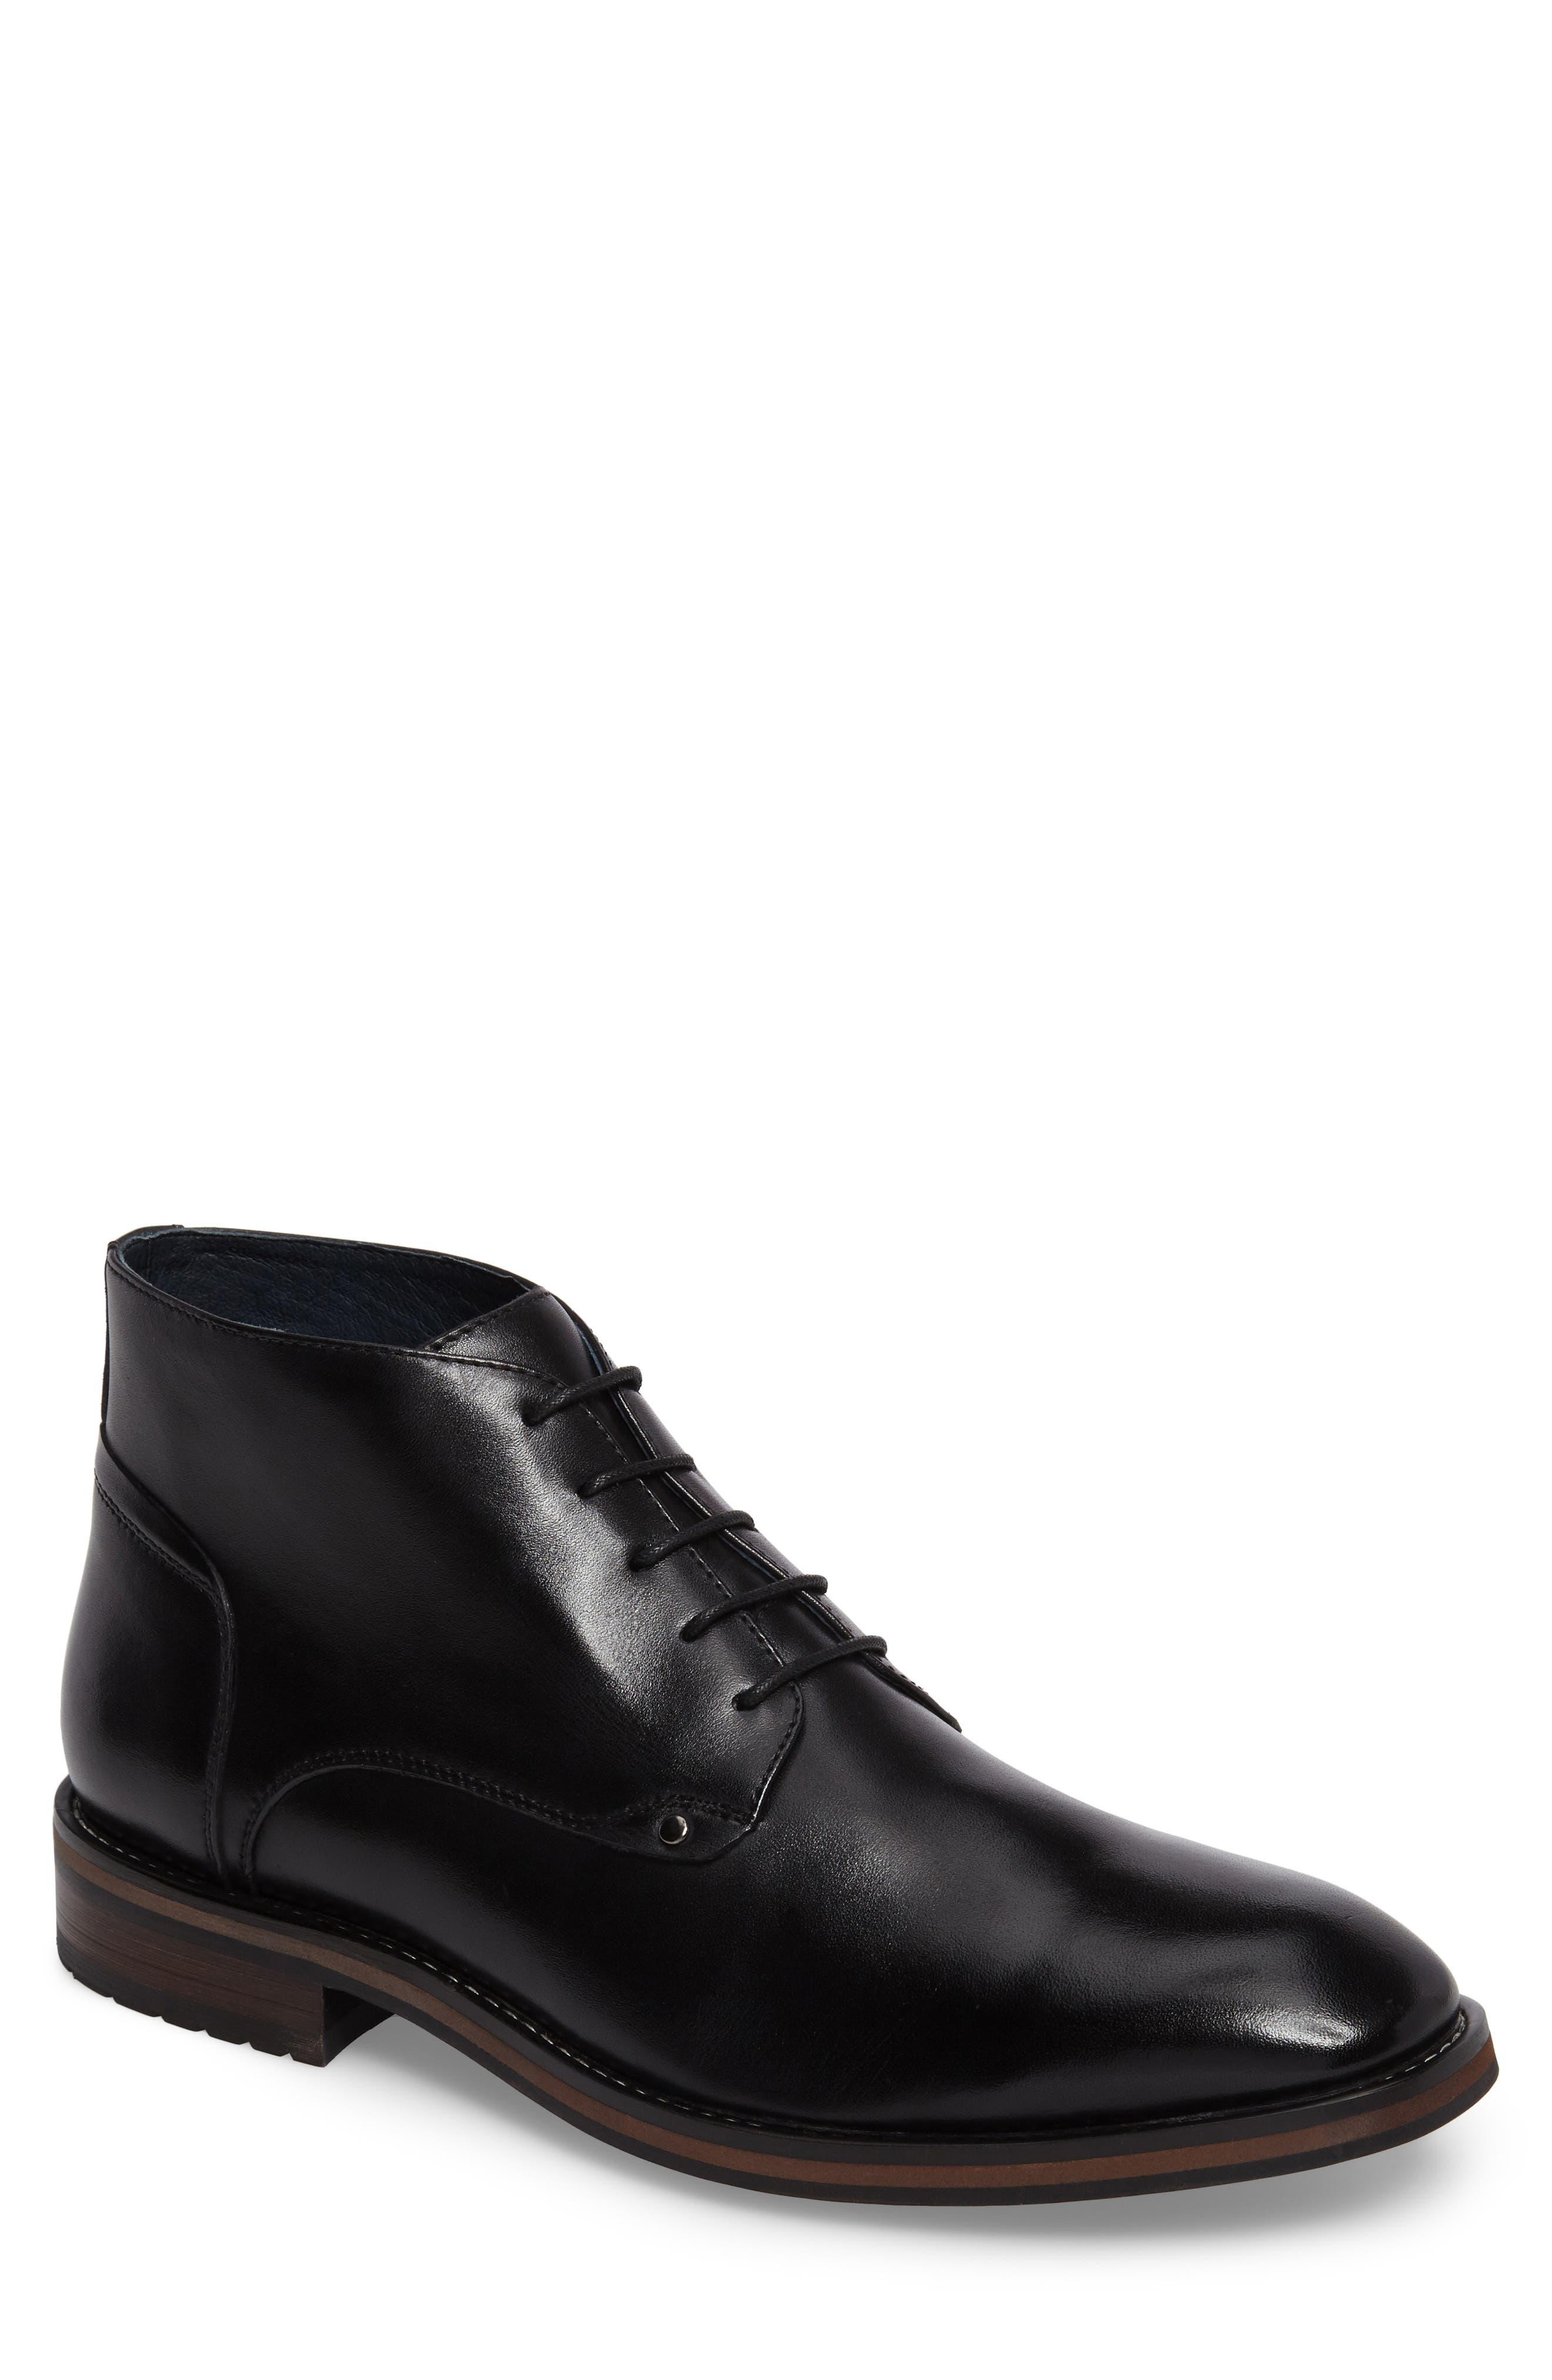 Malta Low Boot,                         Main,                         color, 001